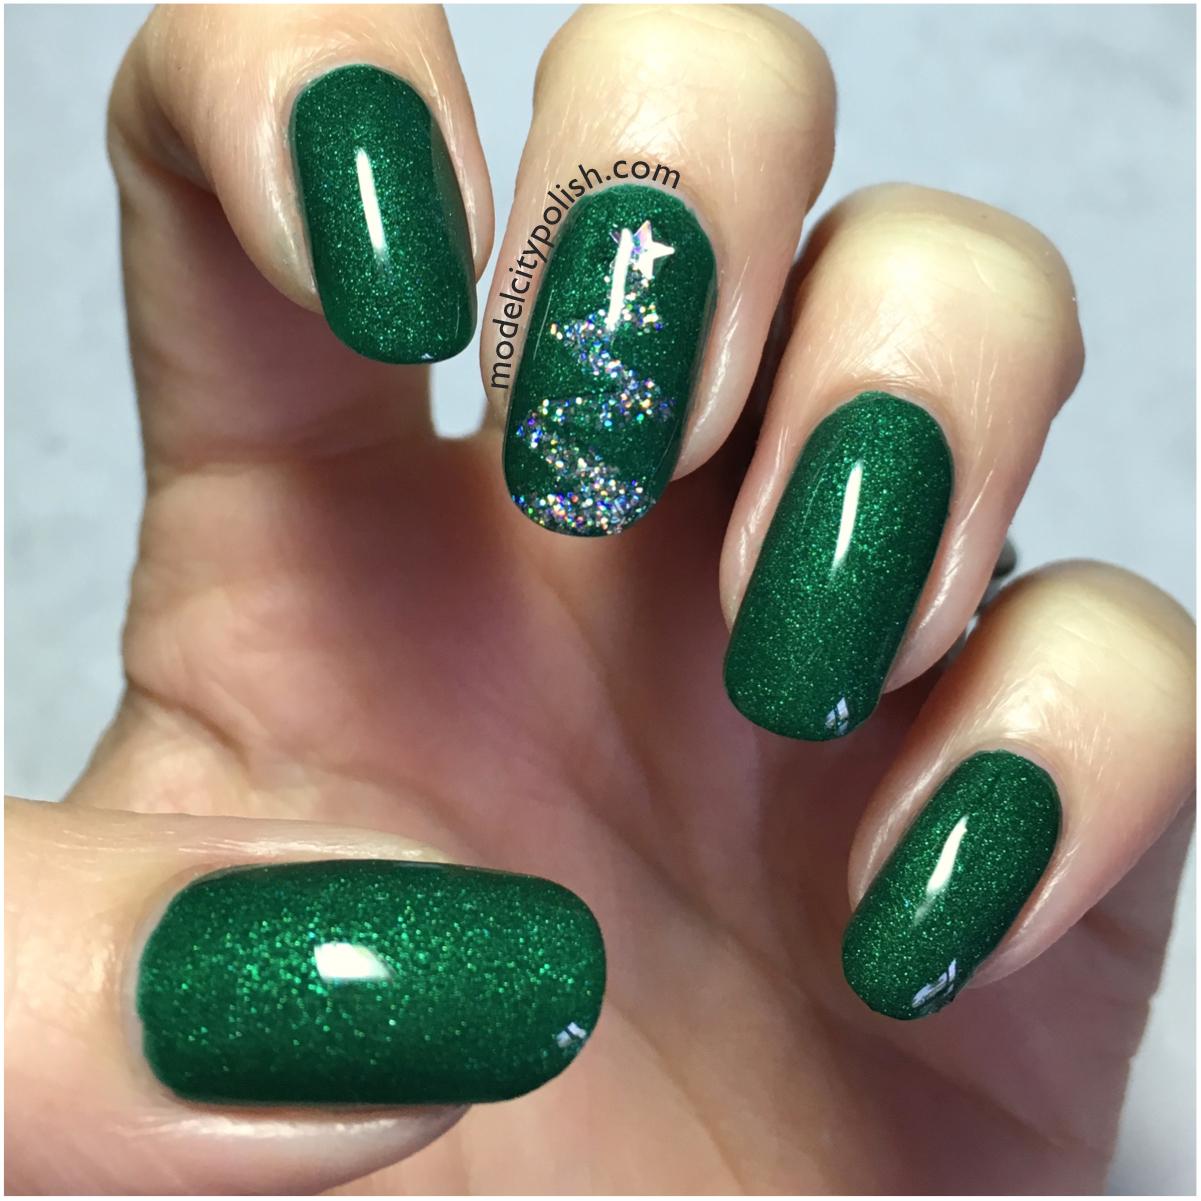 Christmas Tree Nails Design: Challenge Your Nail Art